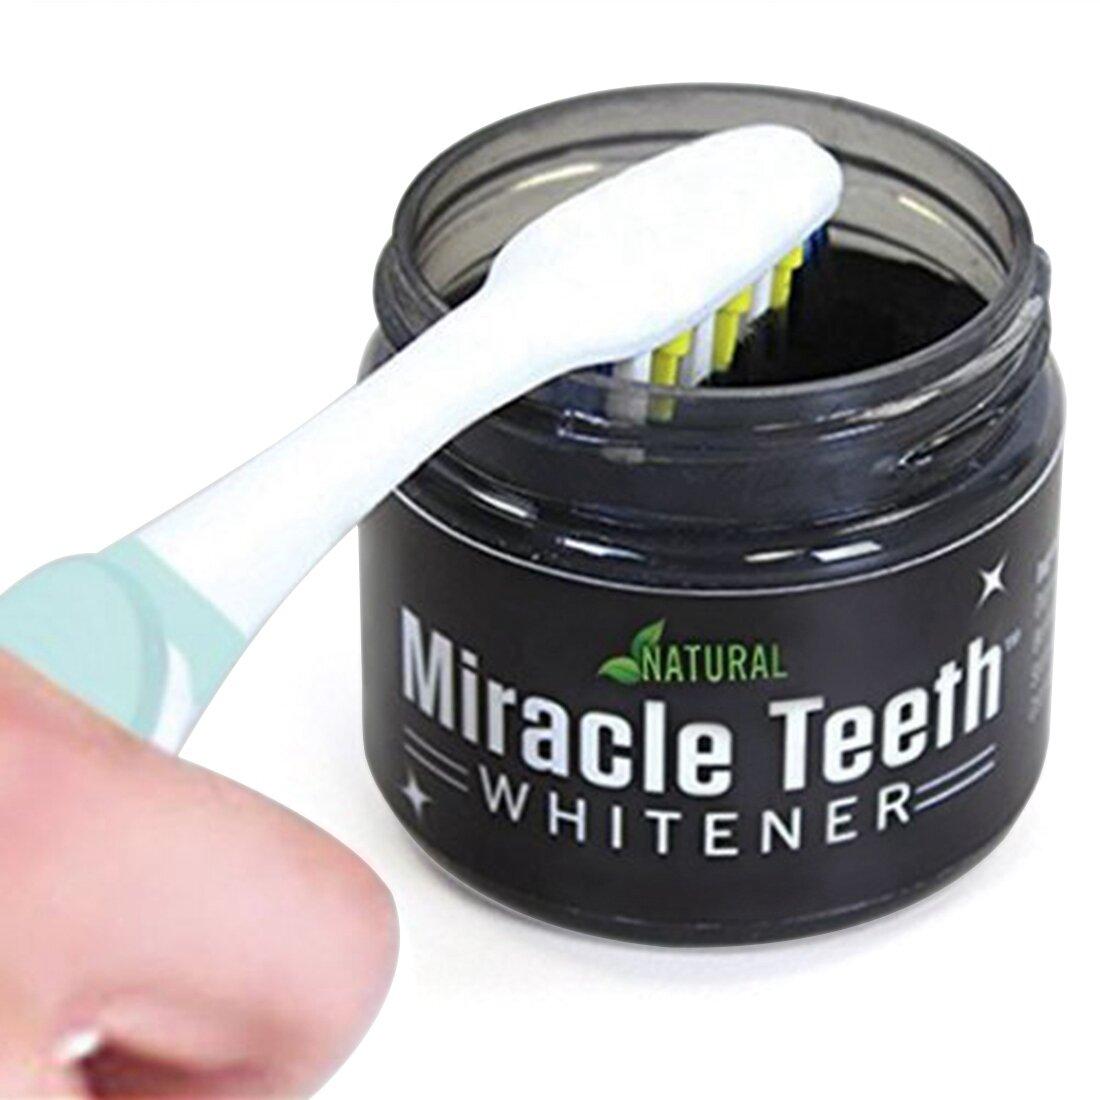 Отбеливатель зубов Miracle Teeth Whitener в Палласовке